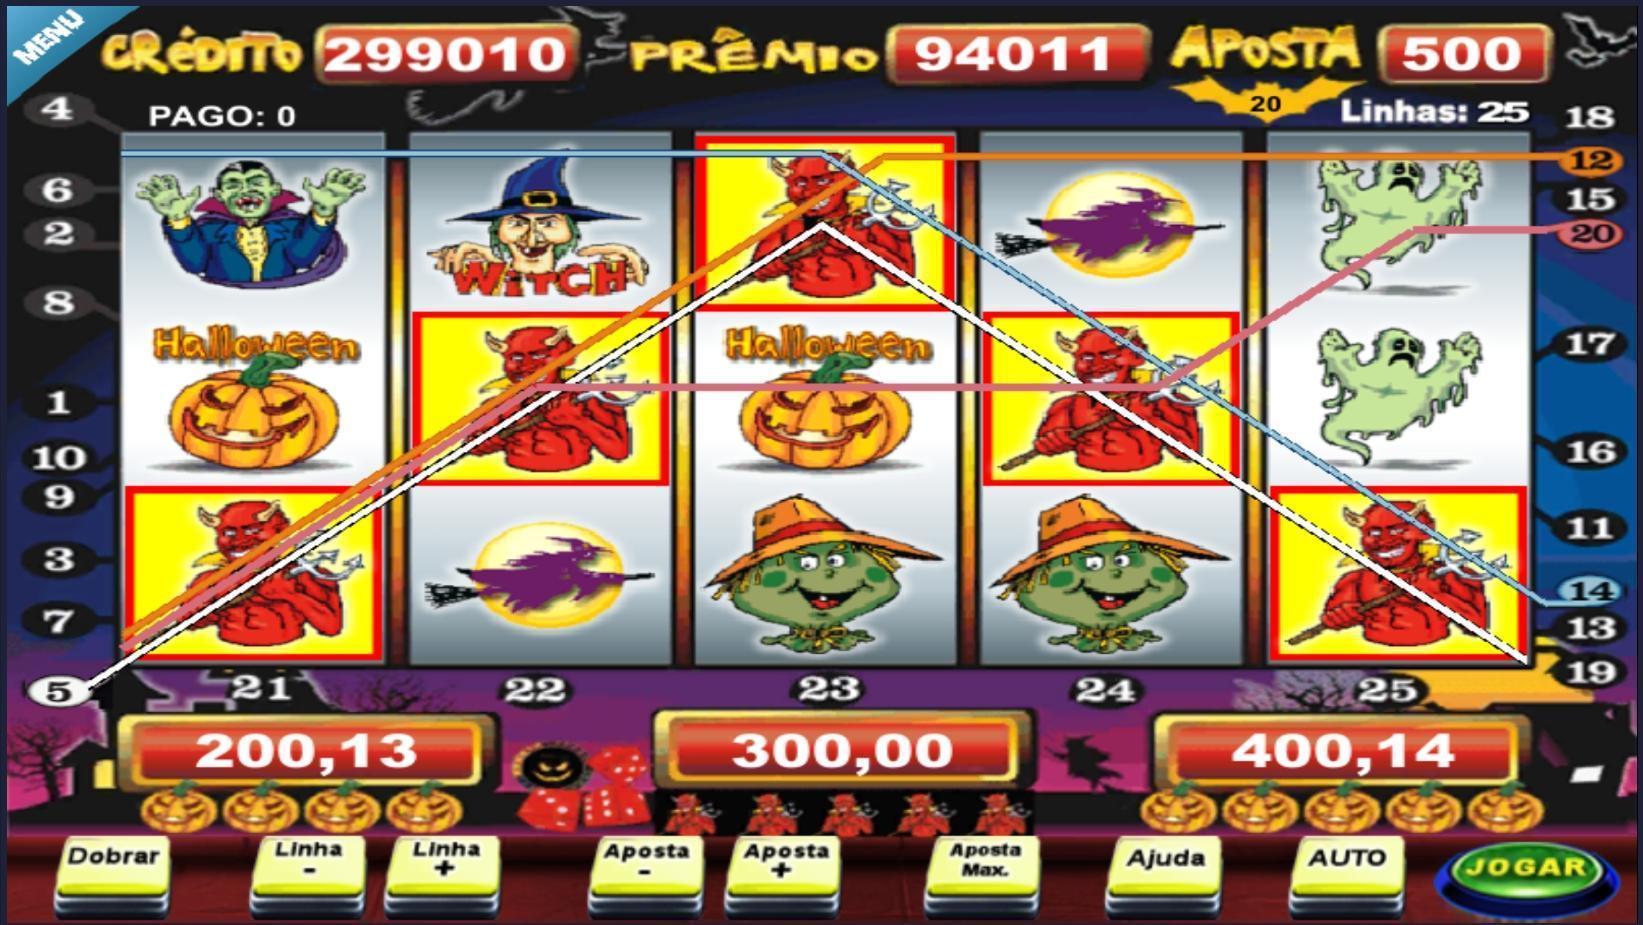 Jackpot keno slot caça 48149